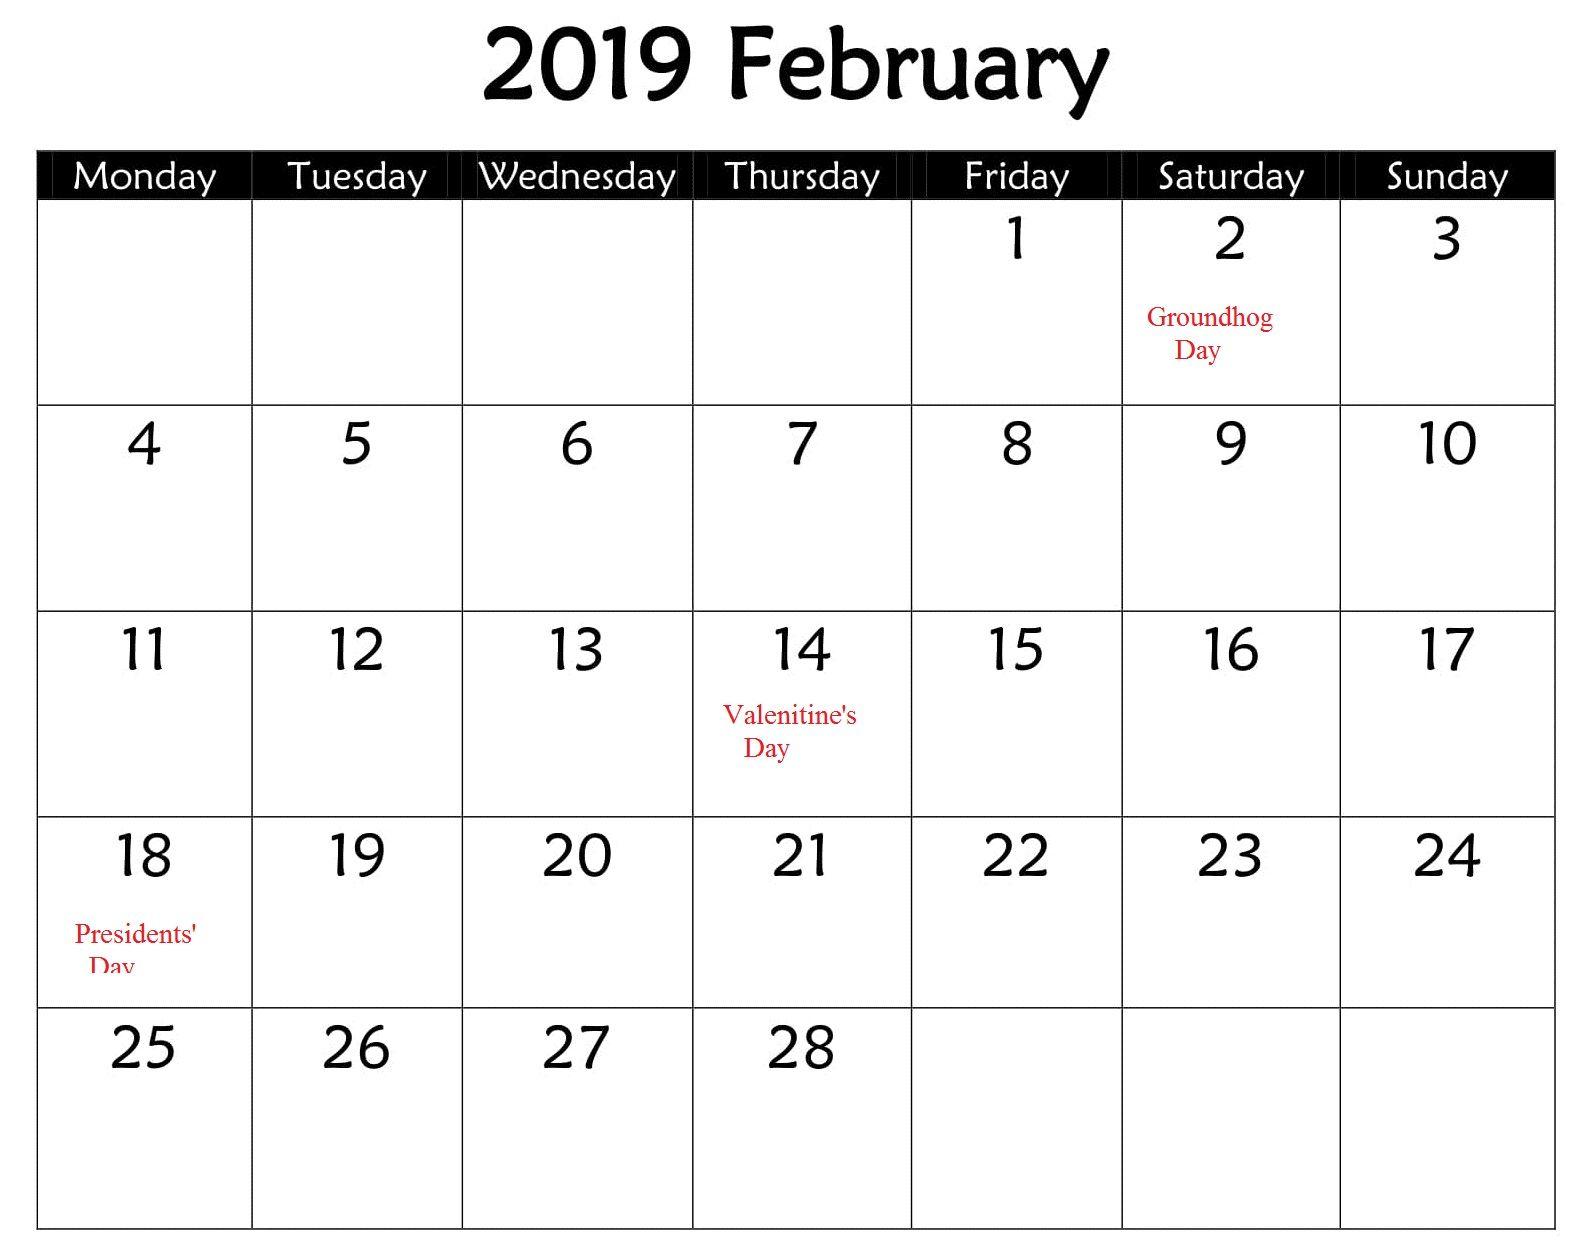 February Calendar Business With Holidays 2019 | February ...